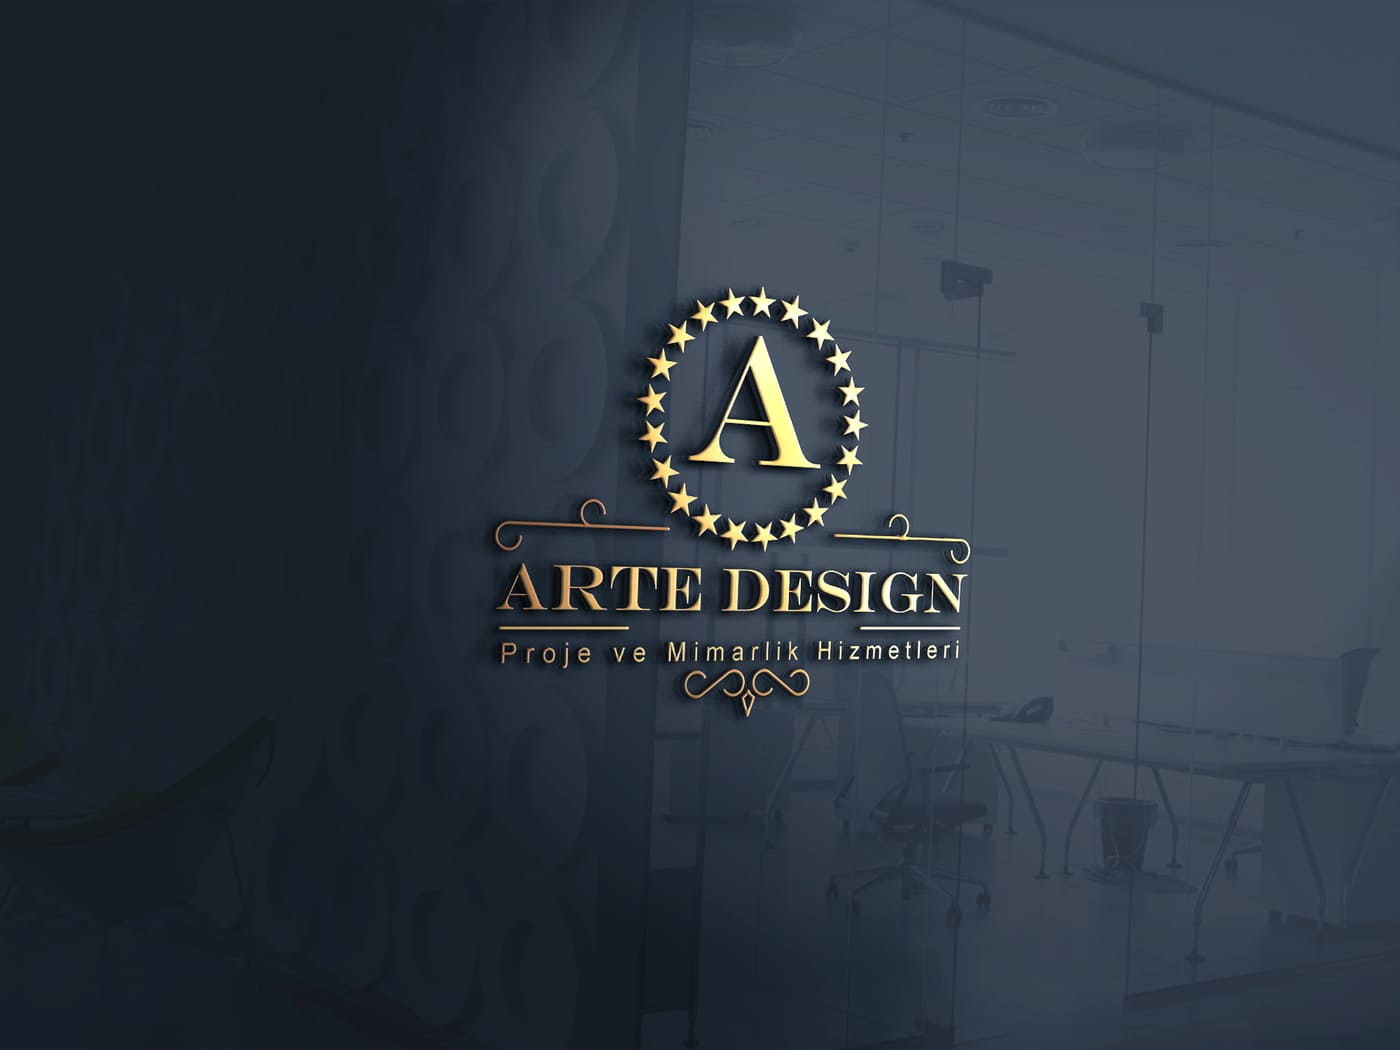 Arte Desing